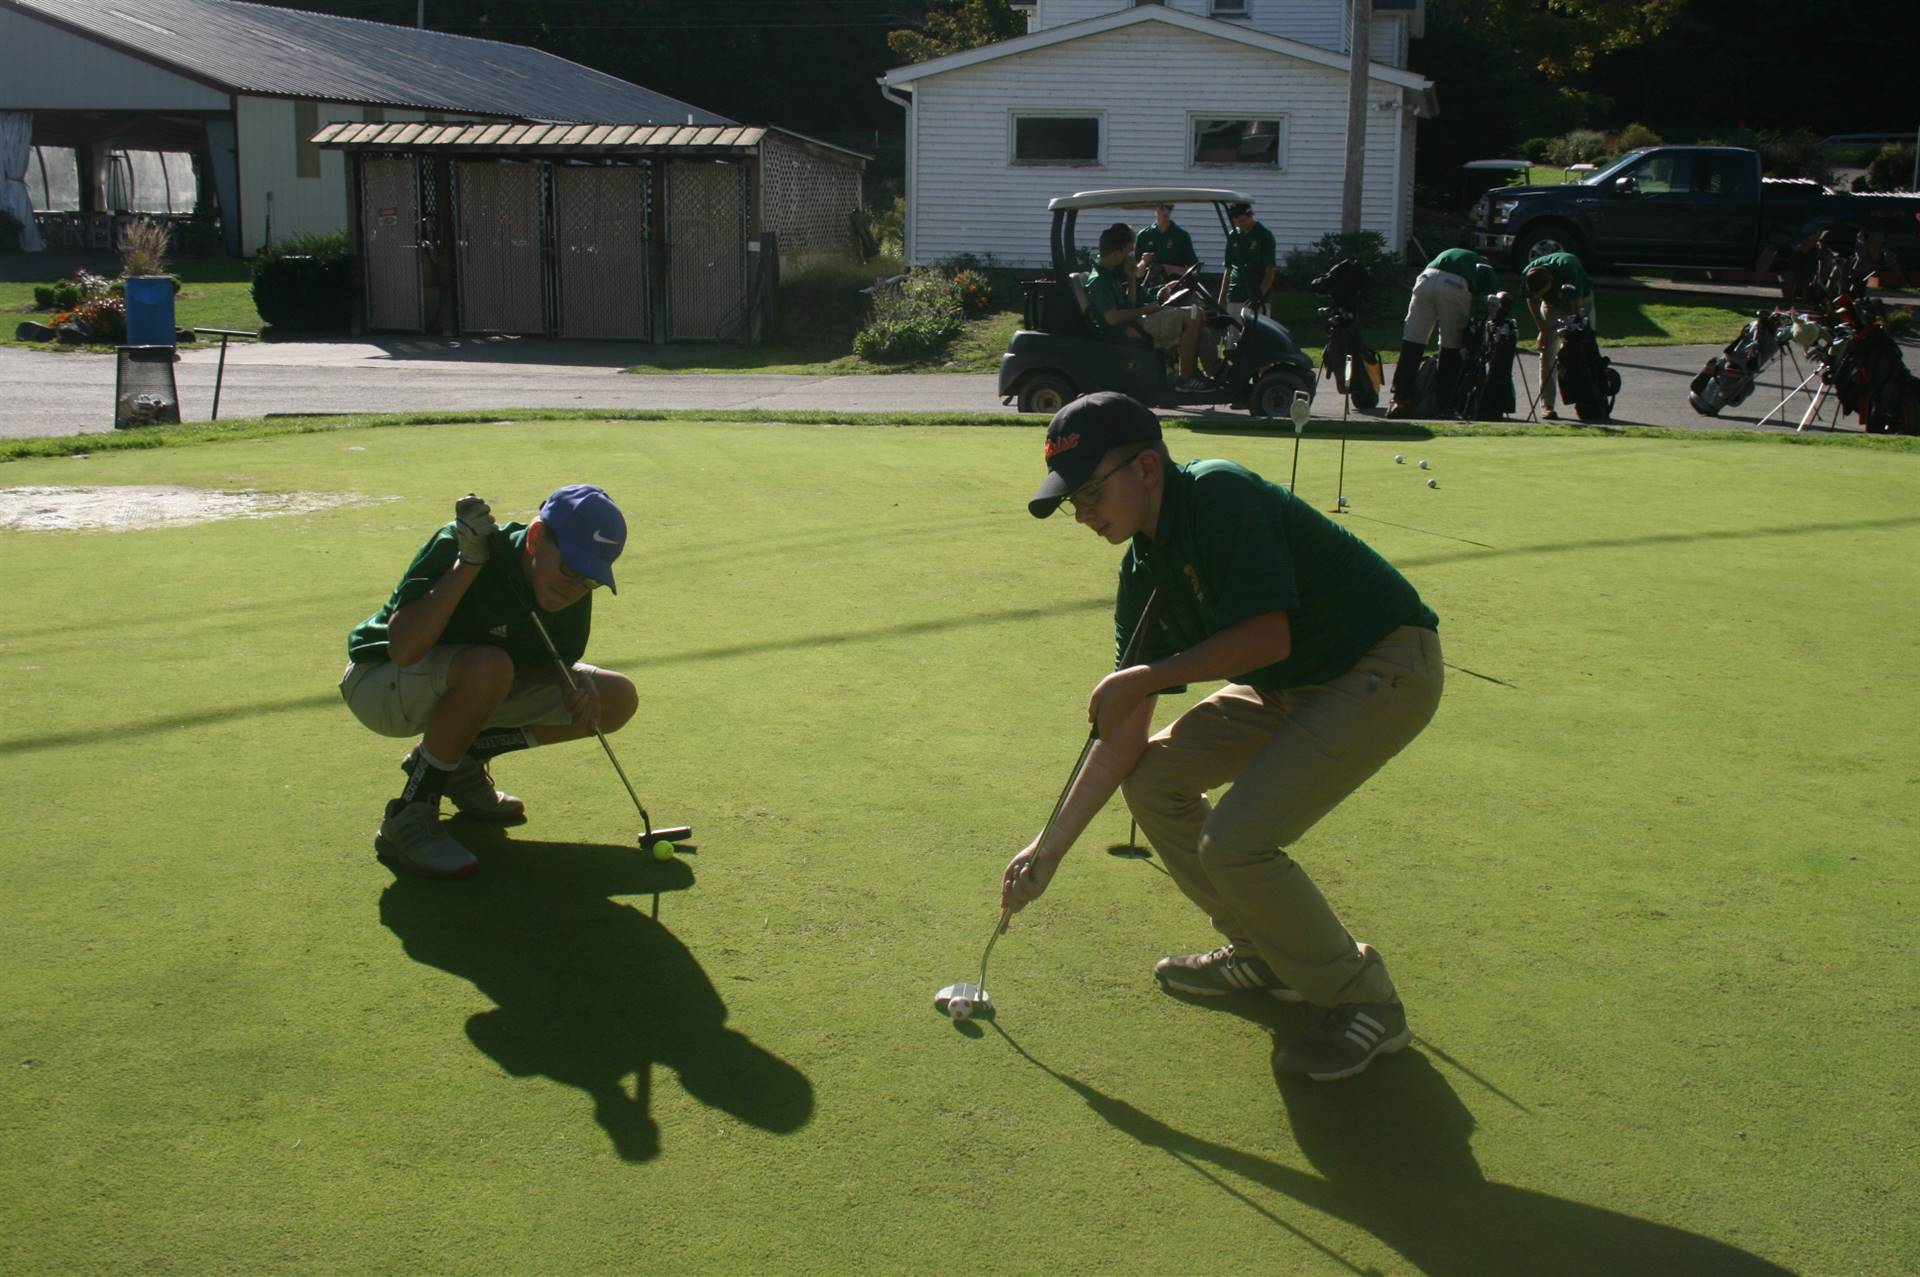 Two boys golfing